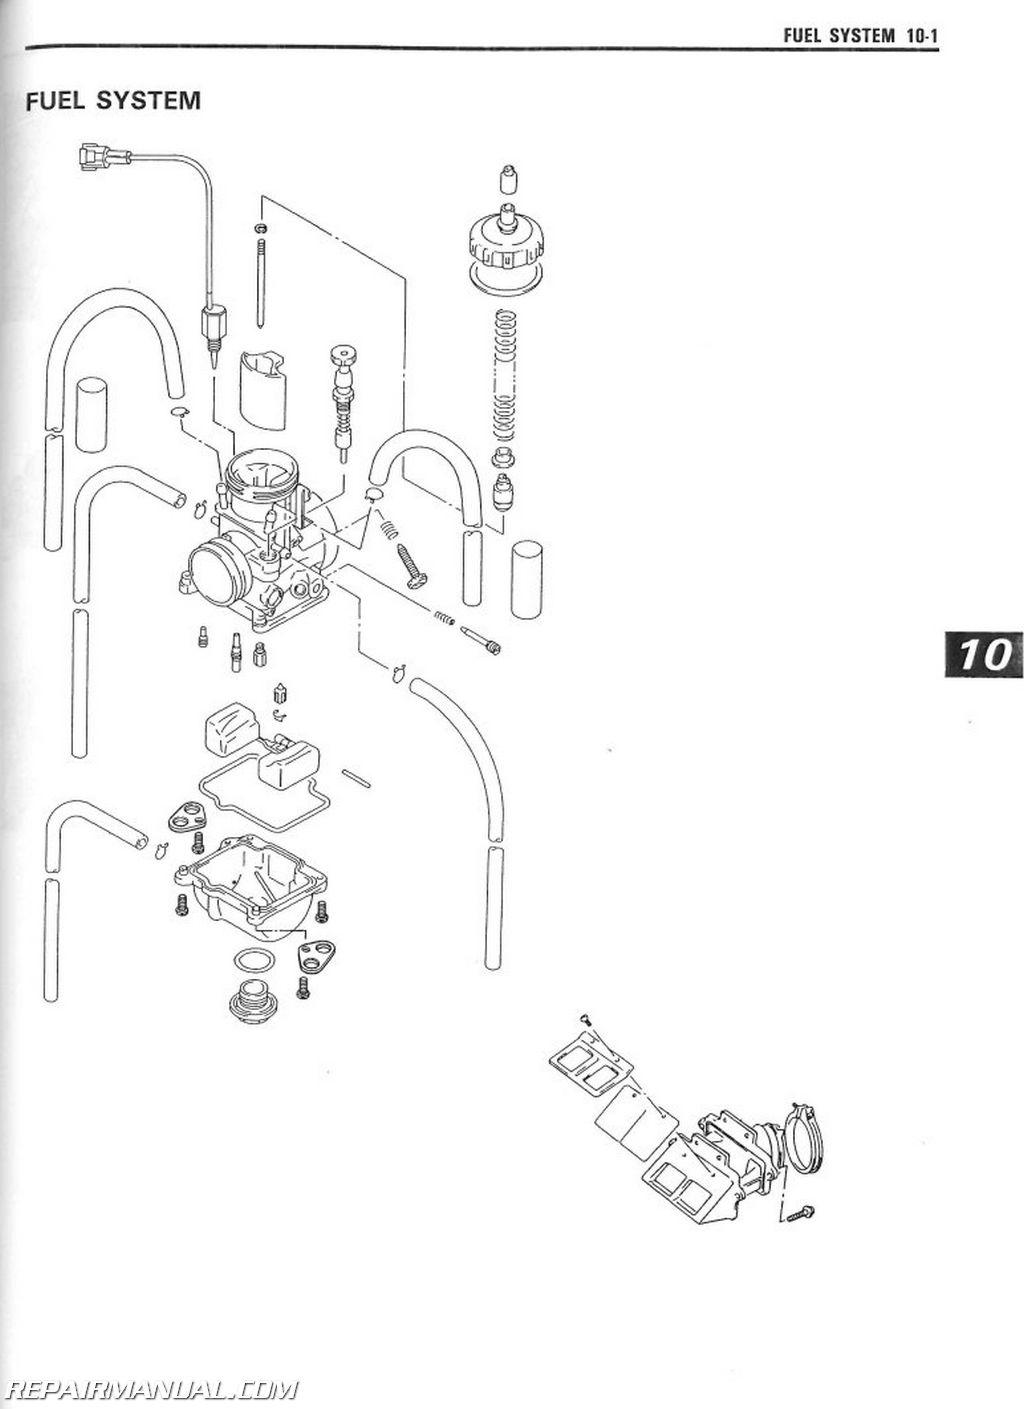 1999 Suzuki RM250W Service Manual